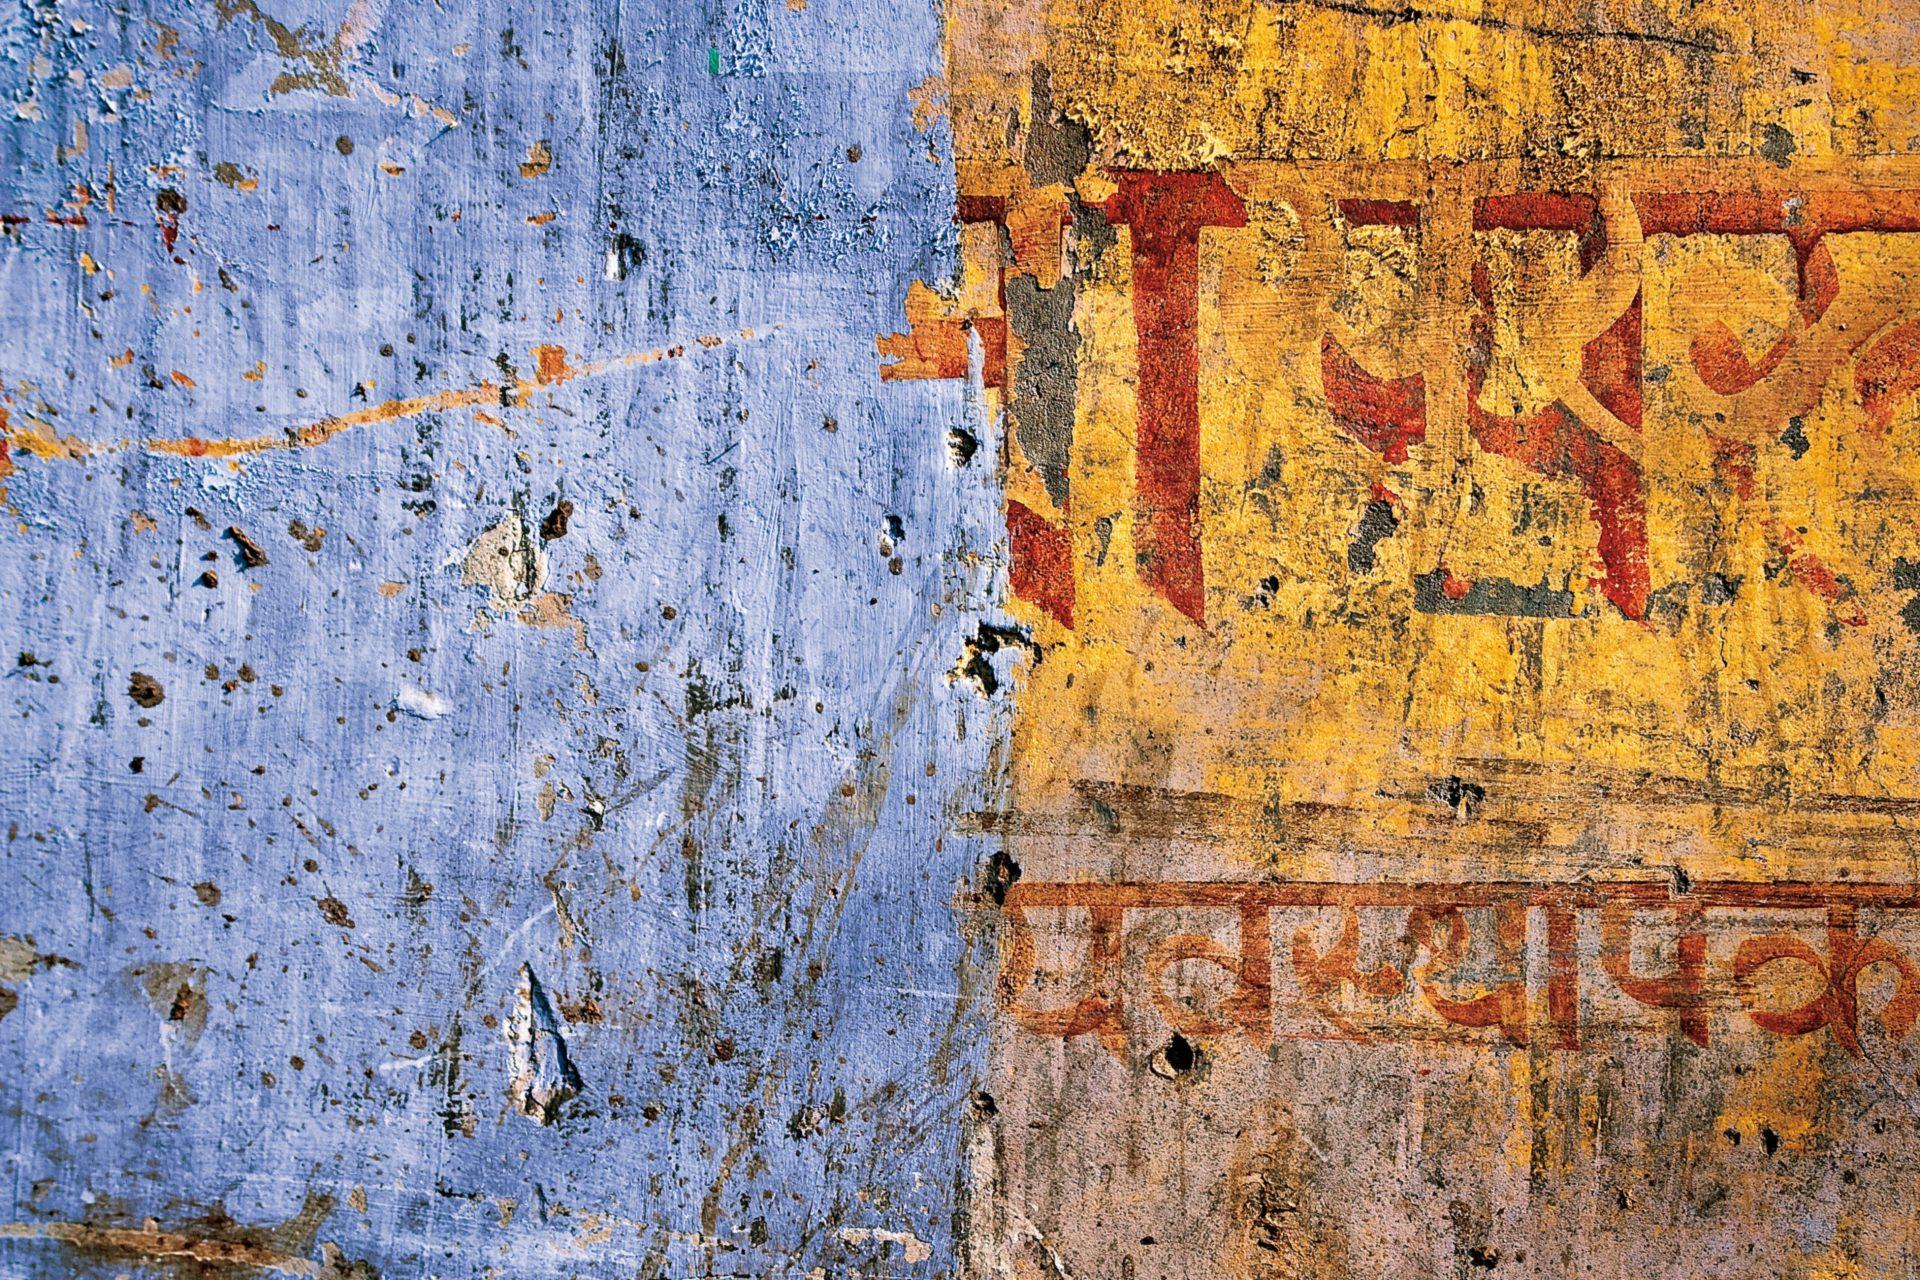 Darren Burns on India's Internet-Led Evolution